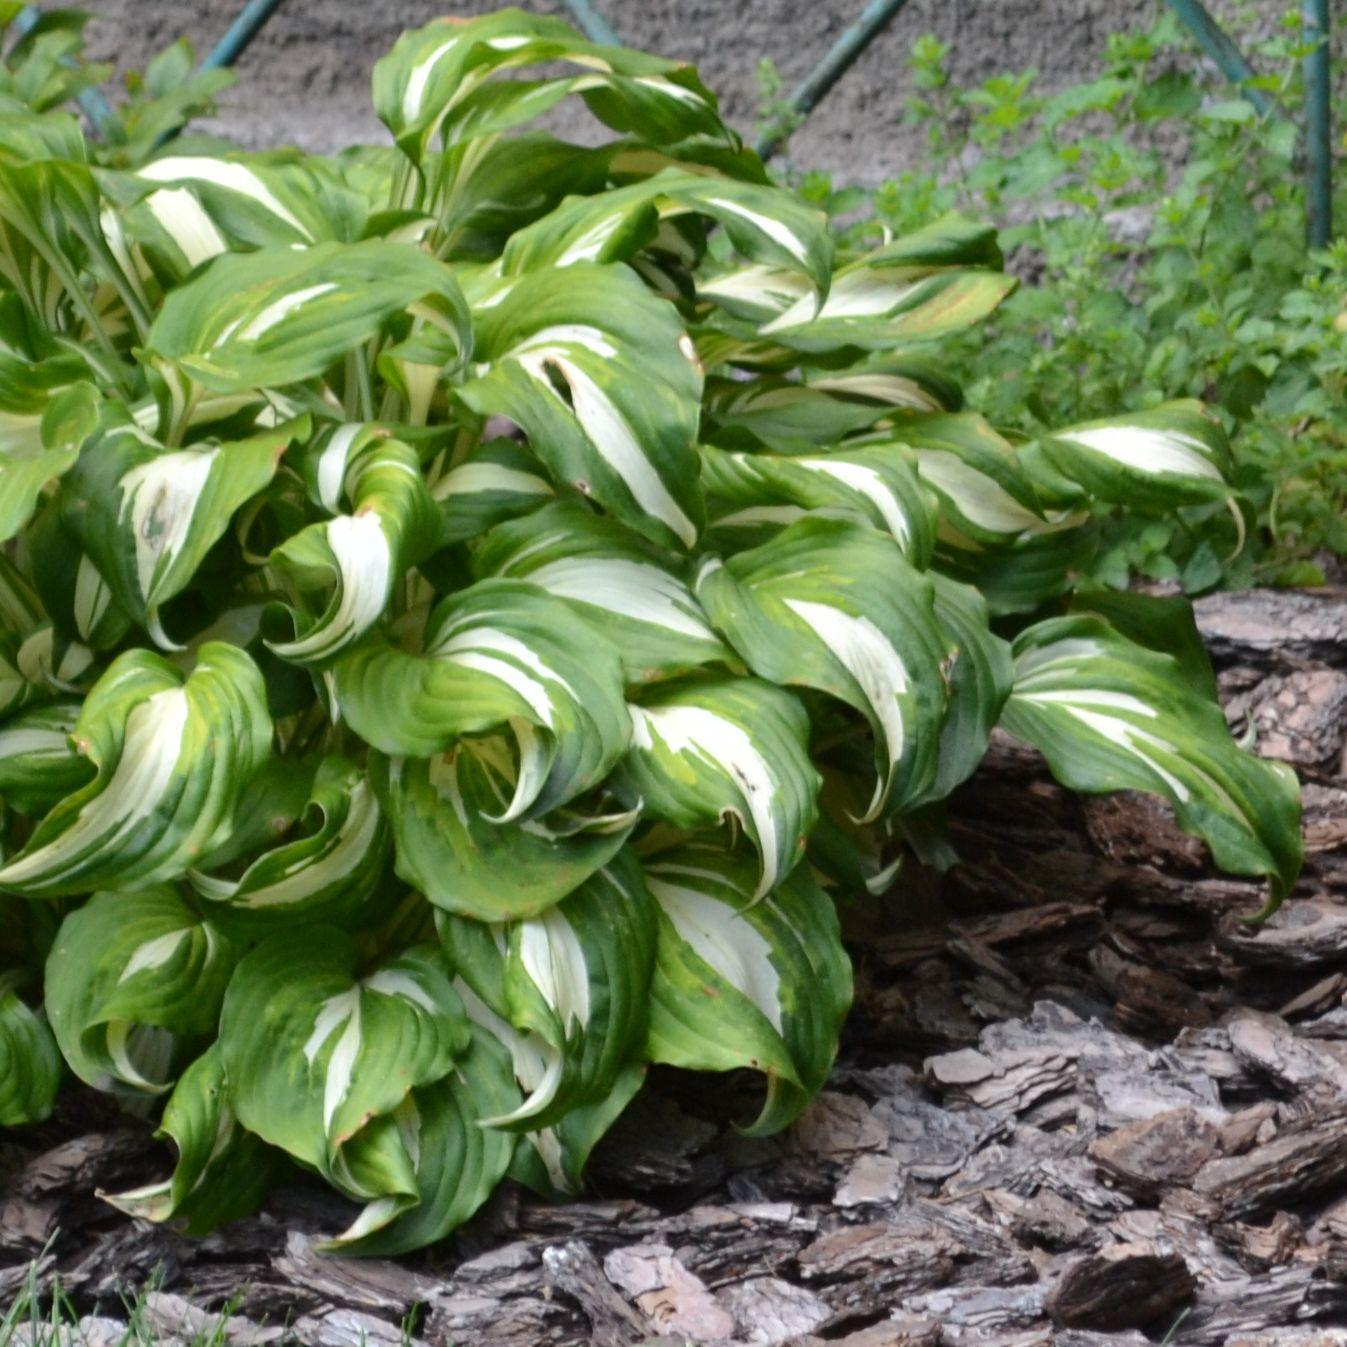 Хоста волнистая Медиовариегата (Hosta undulata mediovariegata)